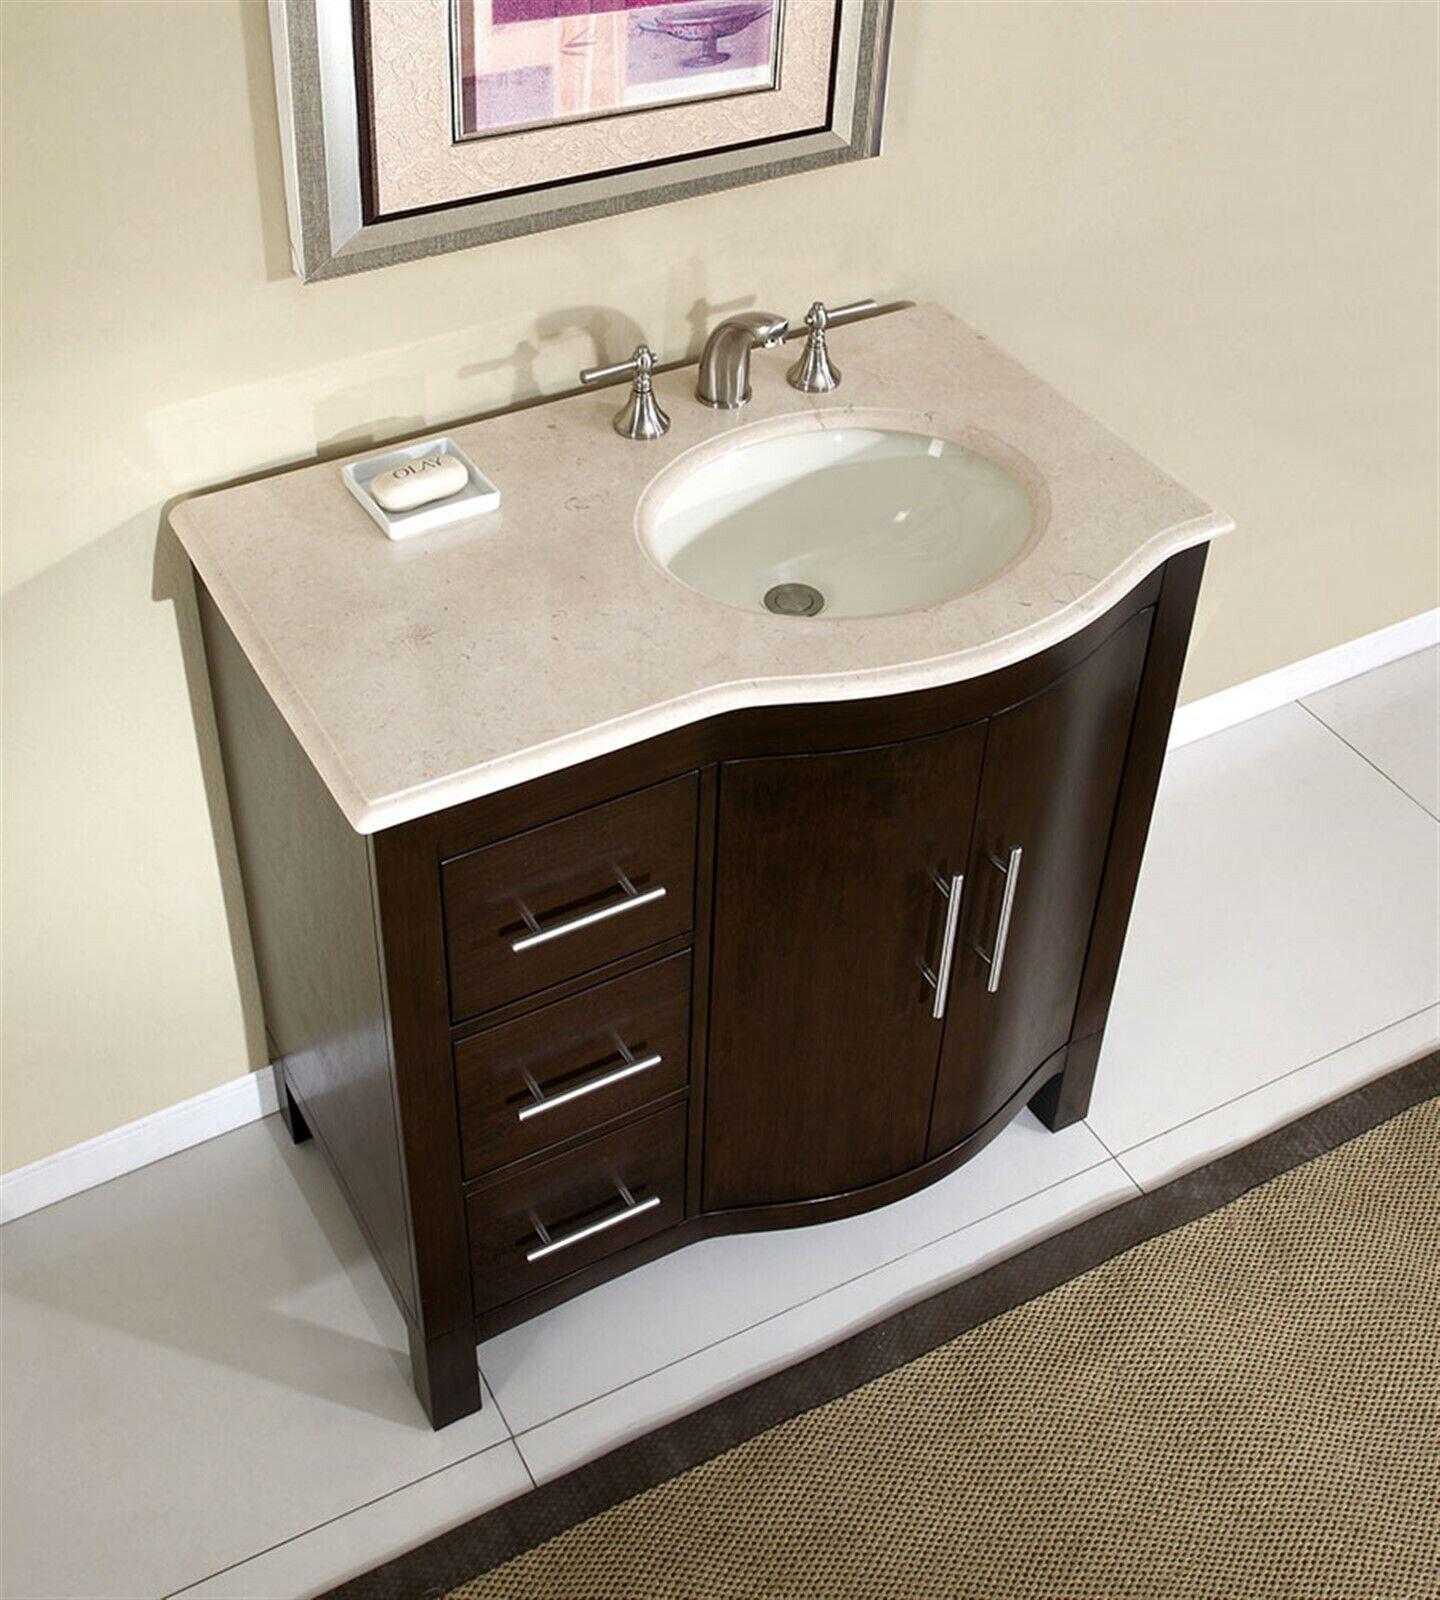 36 Cream Marble Top Bathroom Vanity Single Sink Cabinet Off Center 912cm R Ebay